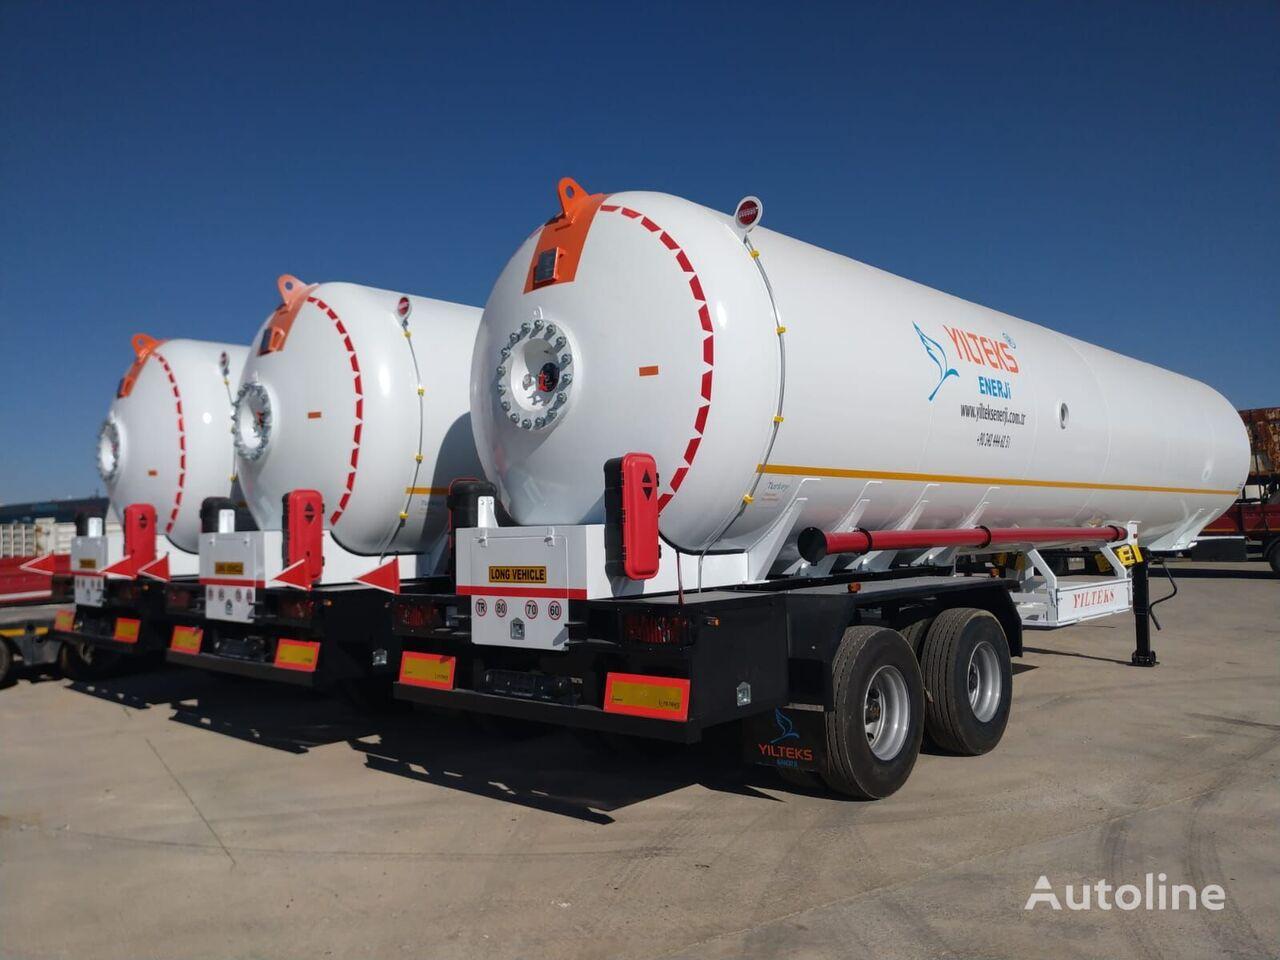 cisterna de gas YILTEKS Trailer LPG nueva